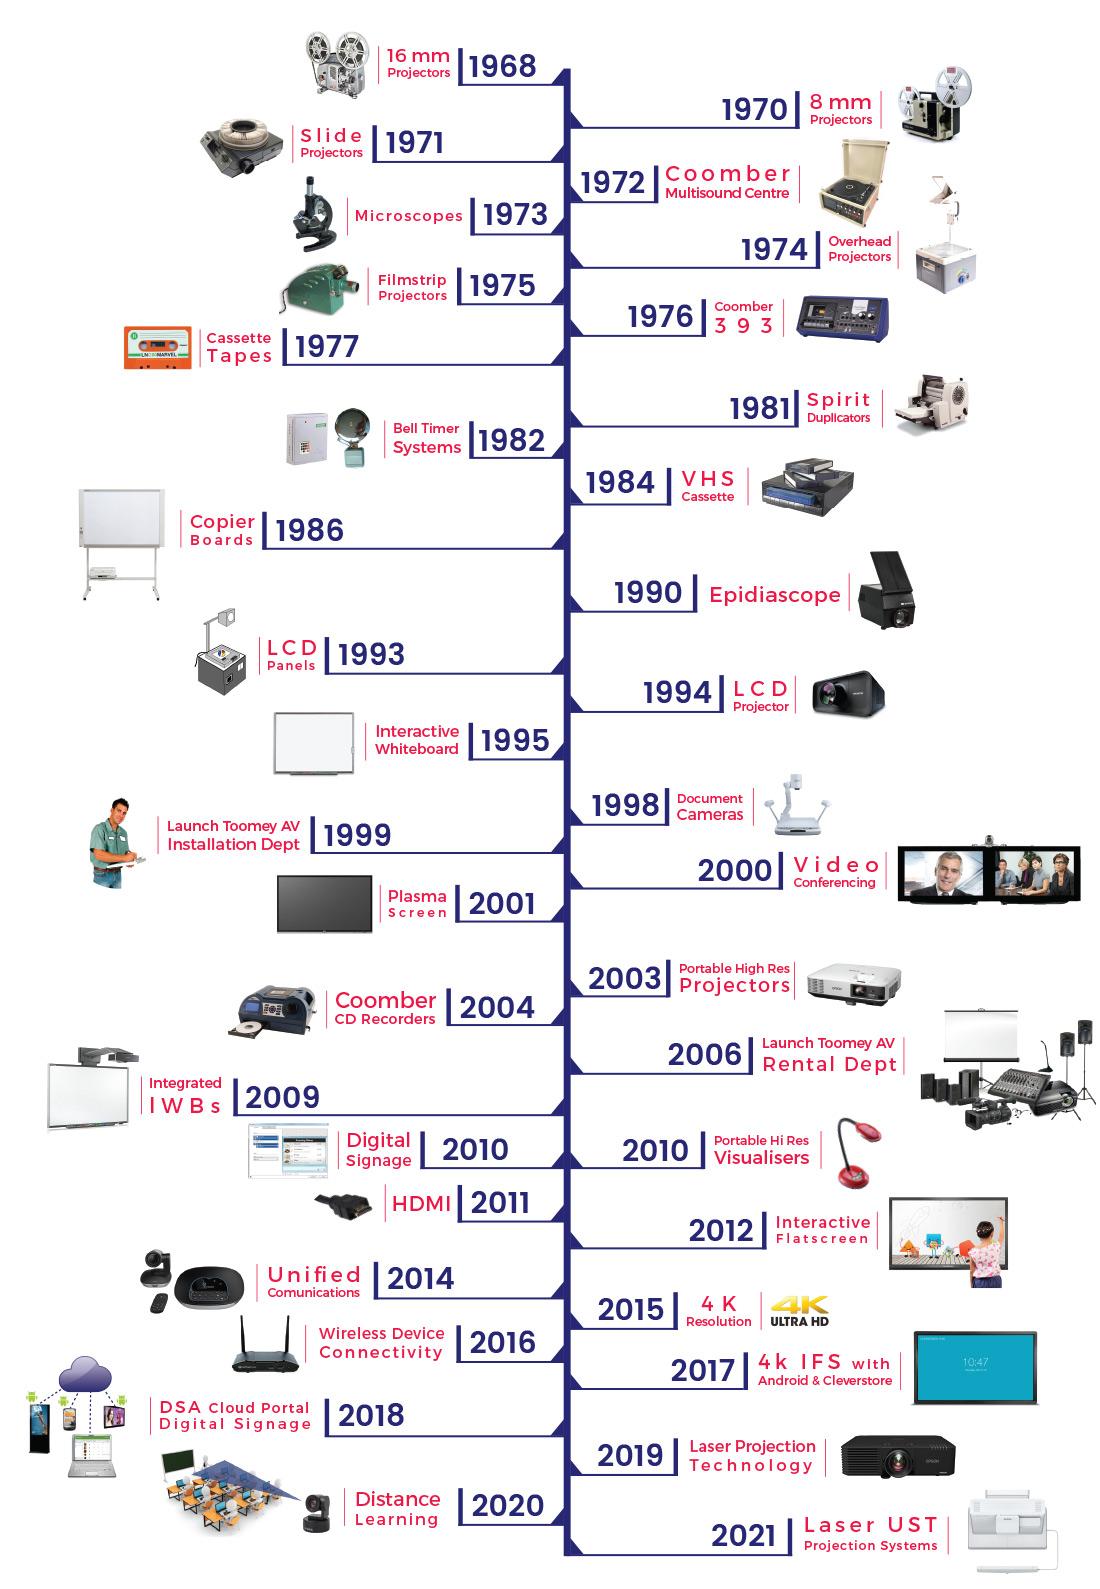 About - Timeline - Toomey Audiovisual Ireland - 2021